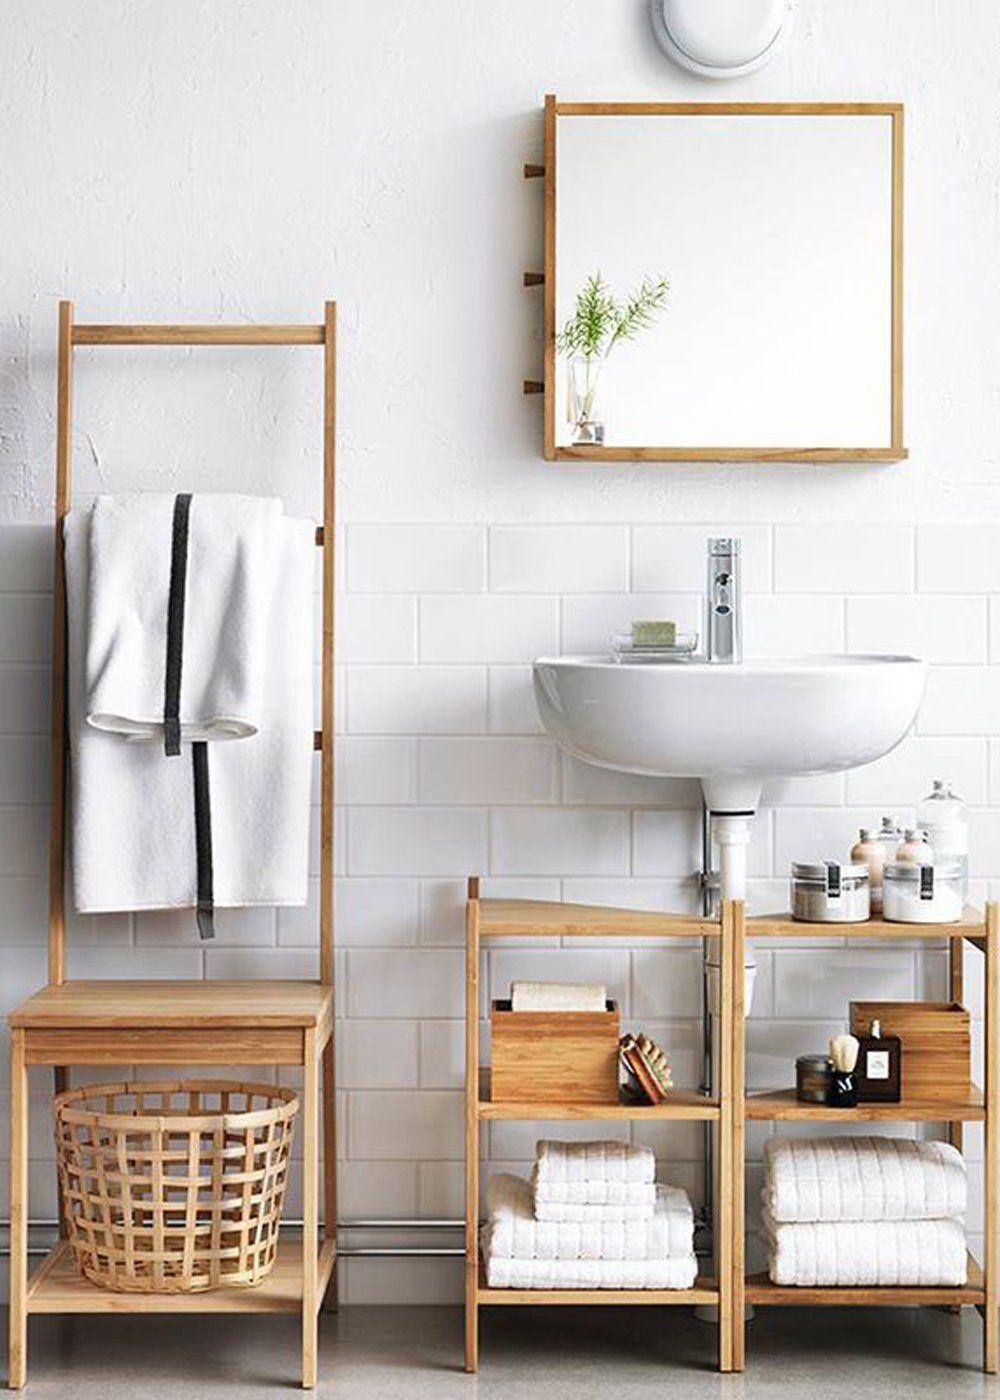 Salle De Bain Nordique ~ salle de bain nordique fabulous gallery of salle de bain salle de